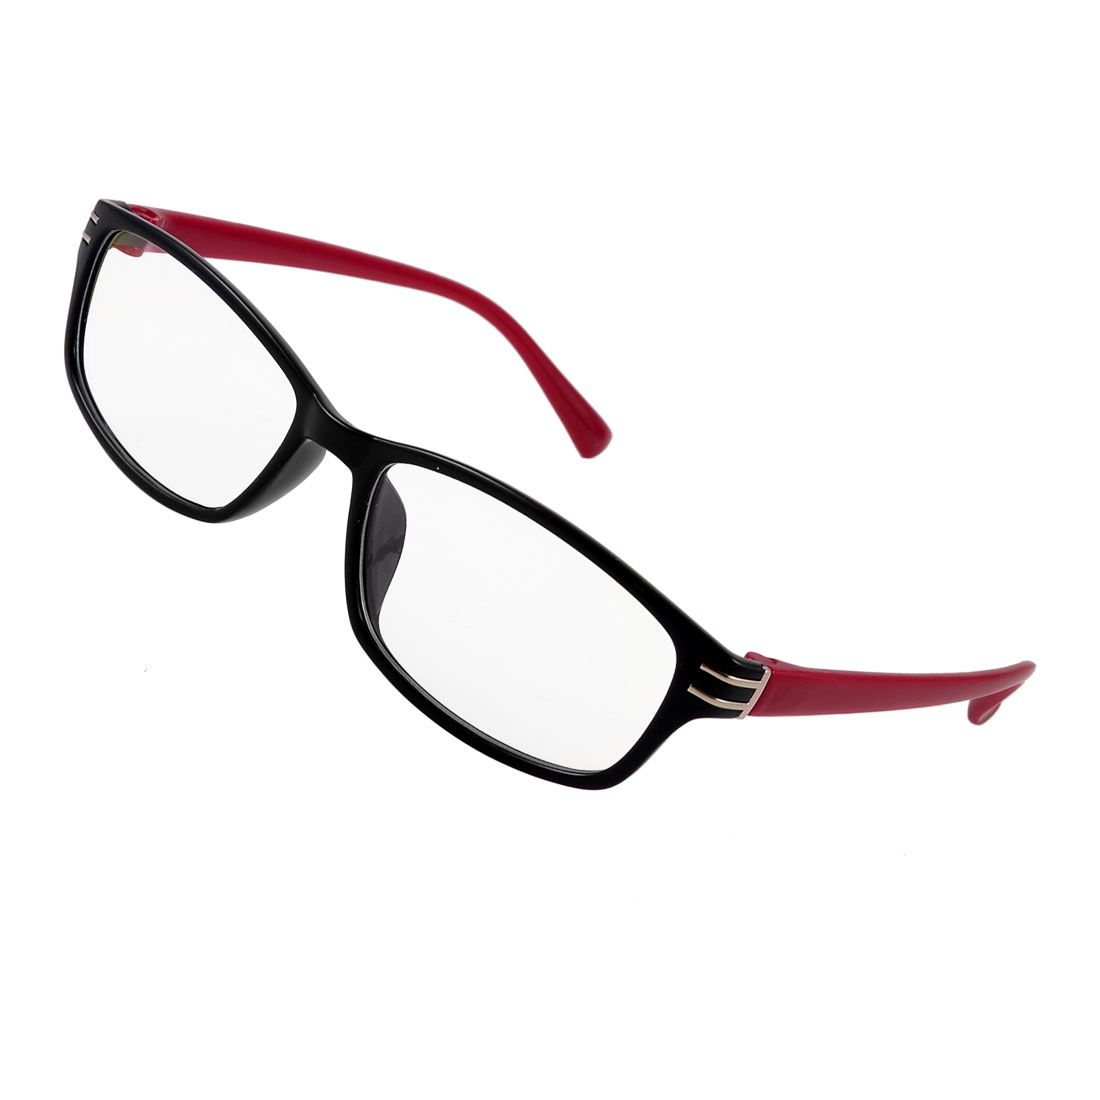 Woman Man Silver Tone Double Metal Bar Decor Red Arms MC Lens Plano Glasses